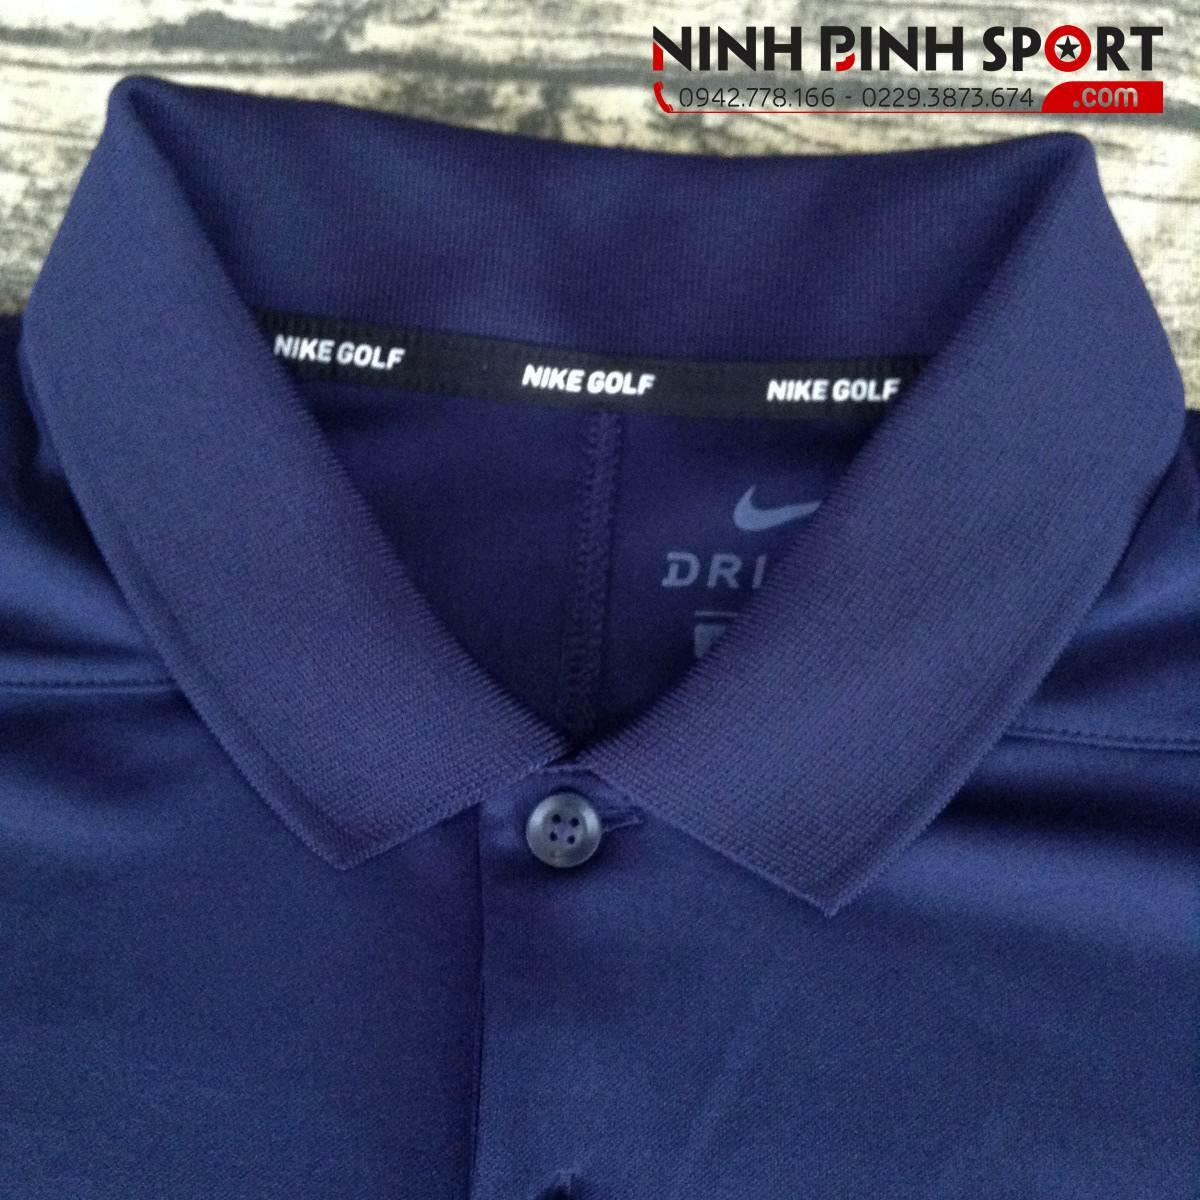 Áo Nike Men's Solid Dry Victory Golf Polo 891857-419